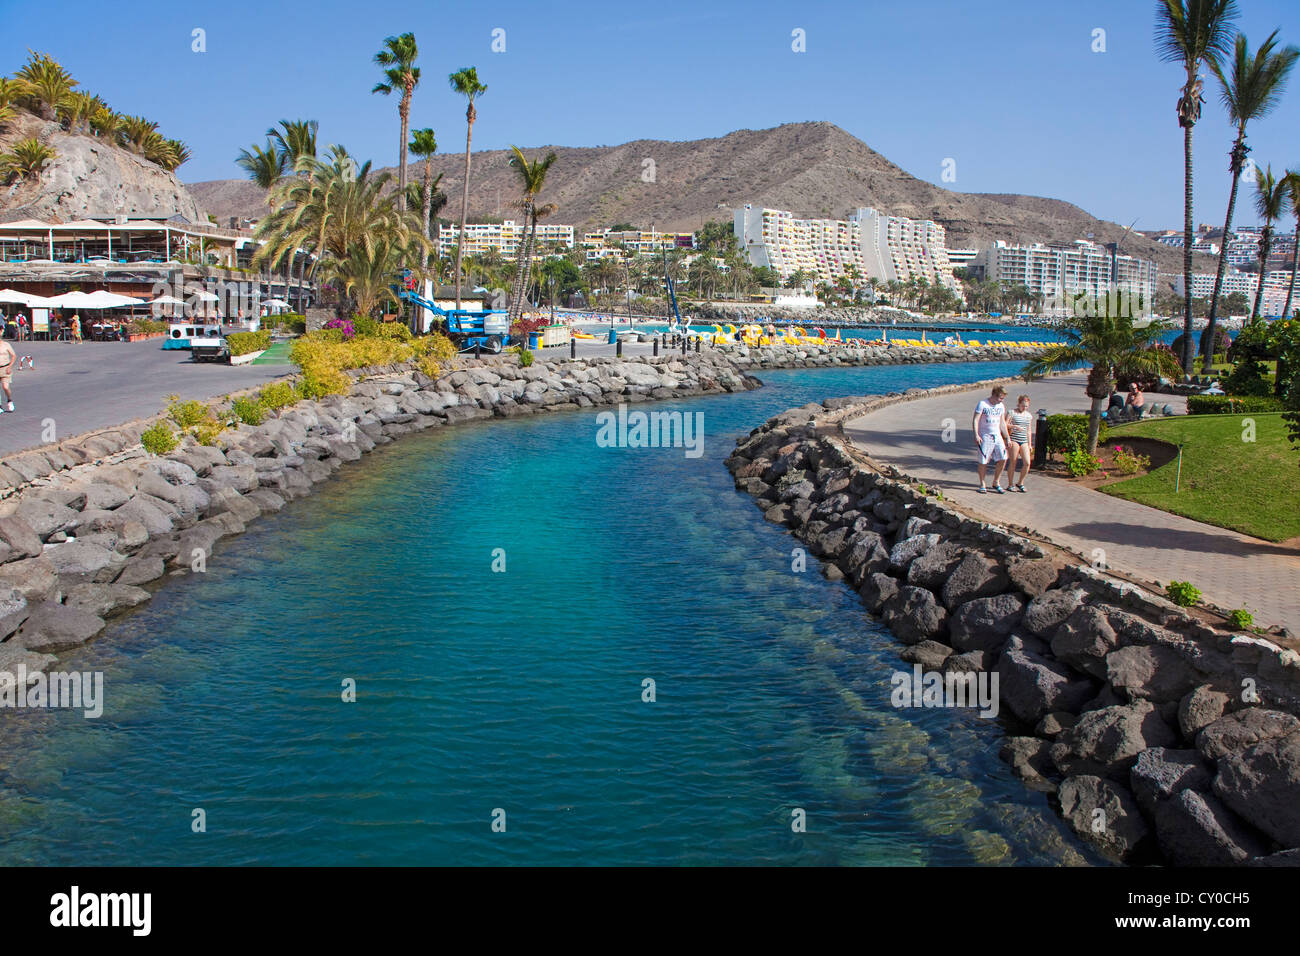 Artificial canal on the Playa de la Verga, Anfi del Mar, Arguineguin, Gran Canaria, Canary Islands, Spain, Europe - Stock Image